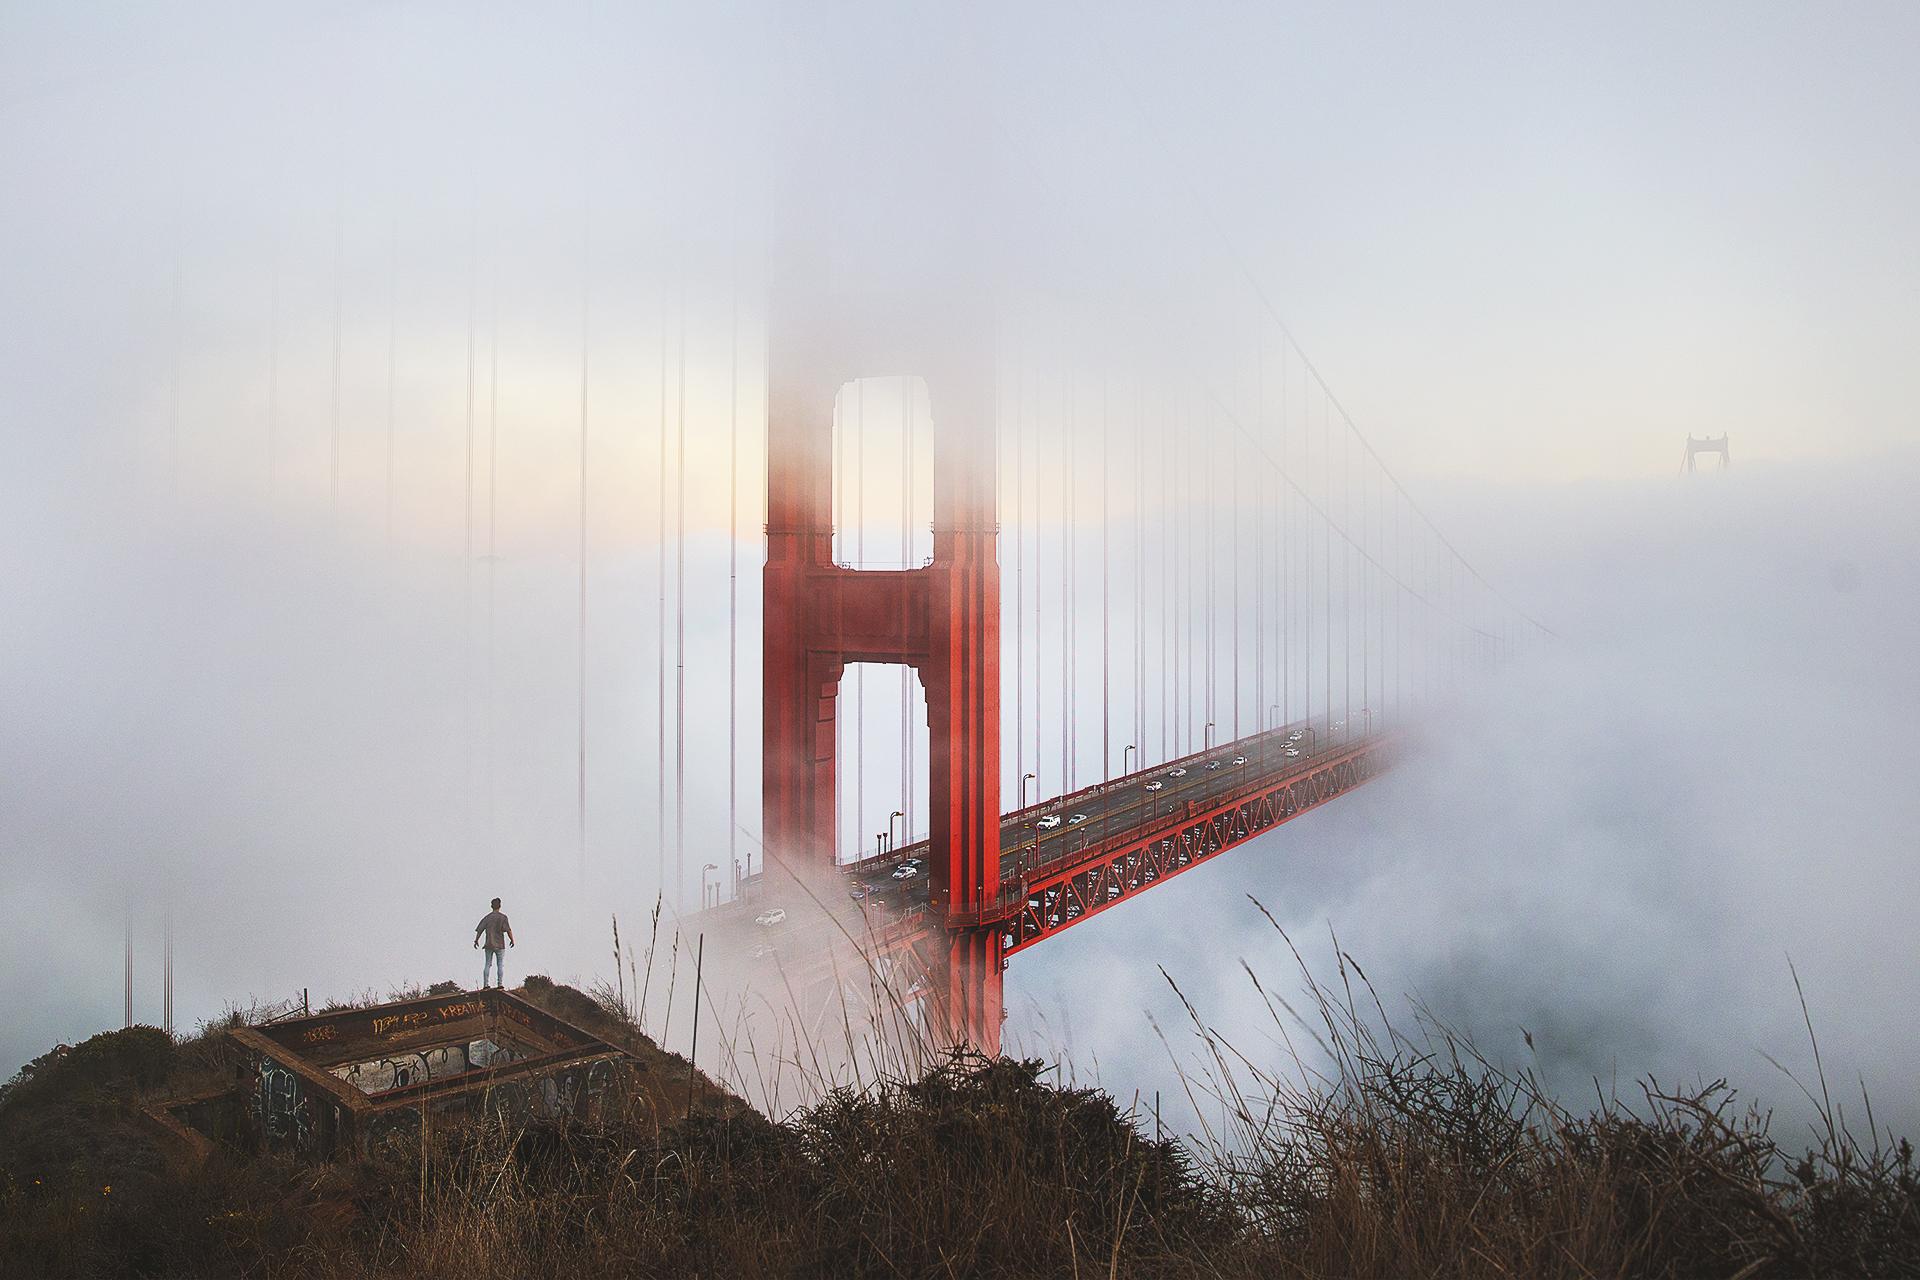 More Than Just Photos 651 - Golden Gate Bridge